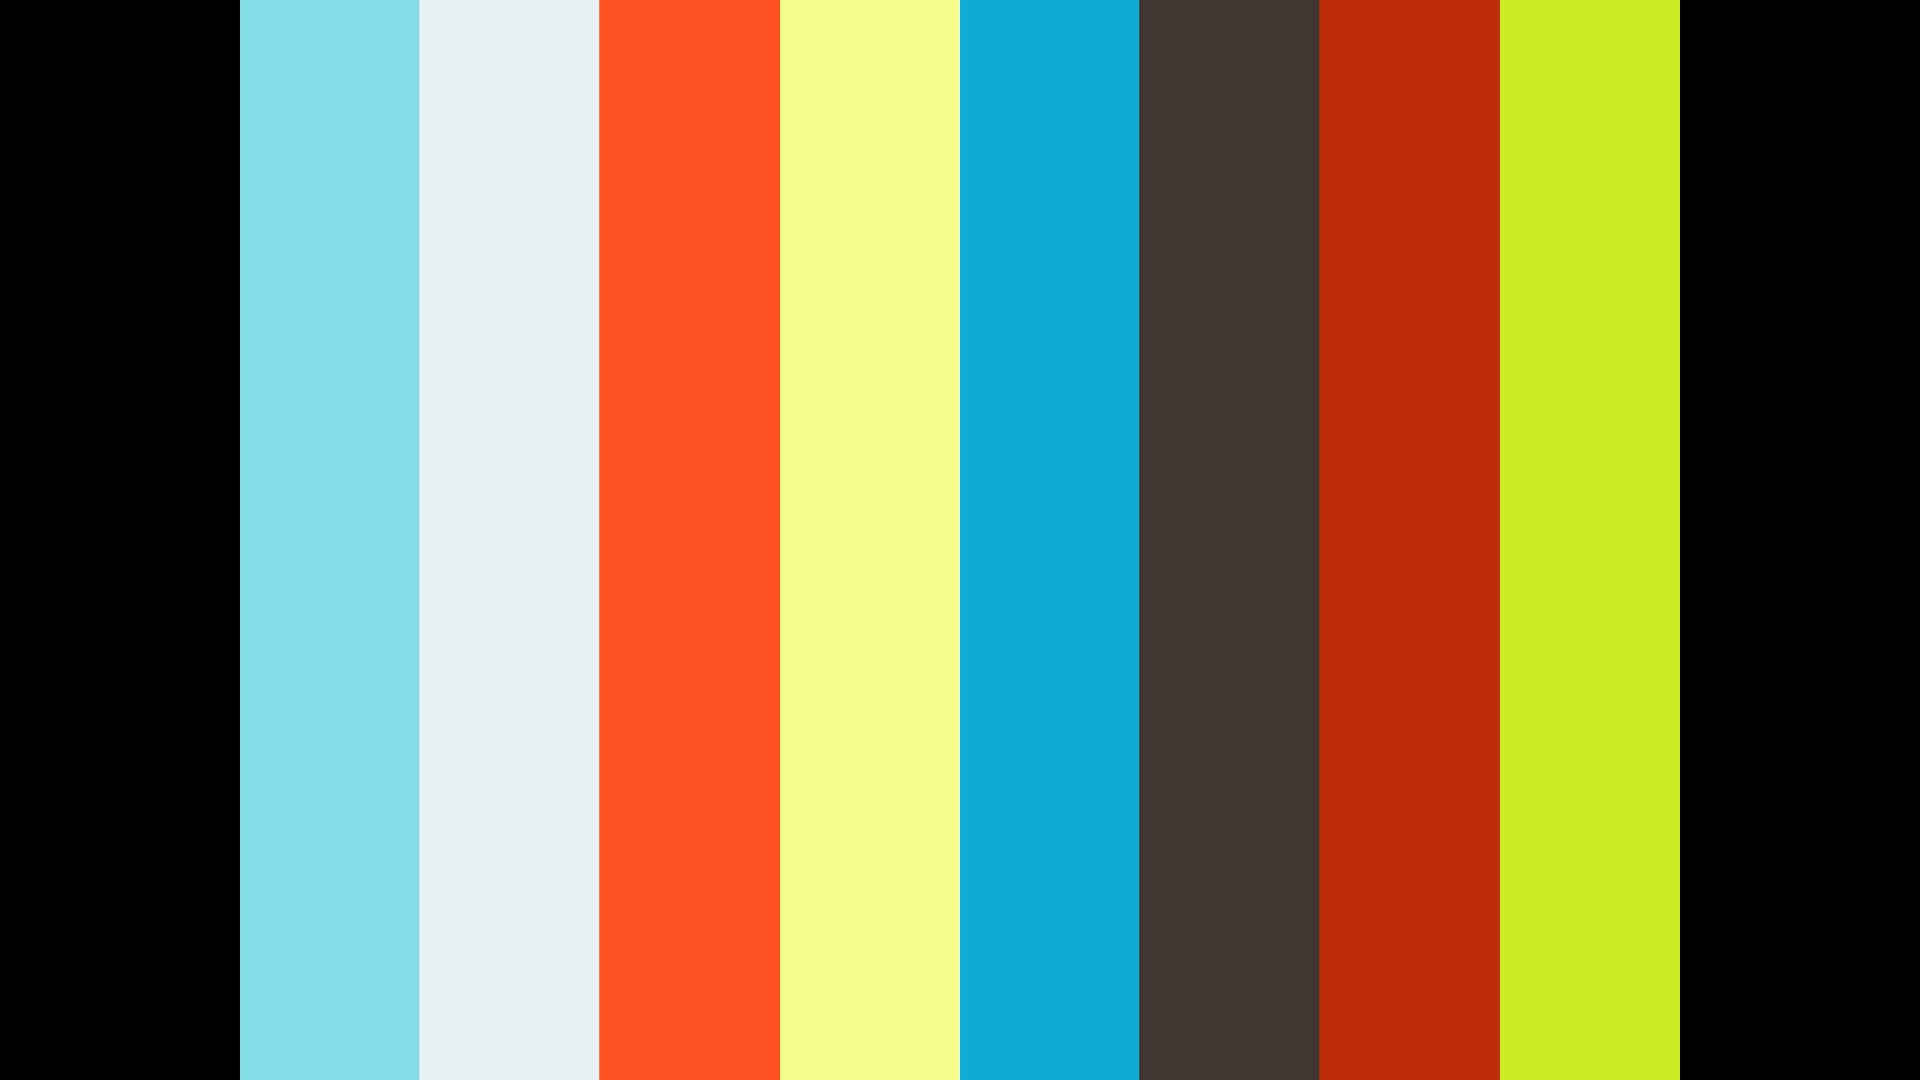 LIVE 17 MARS - ZUMBA - MELISSA